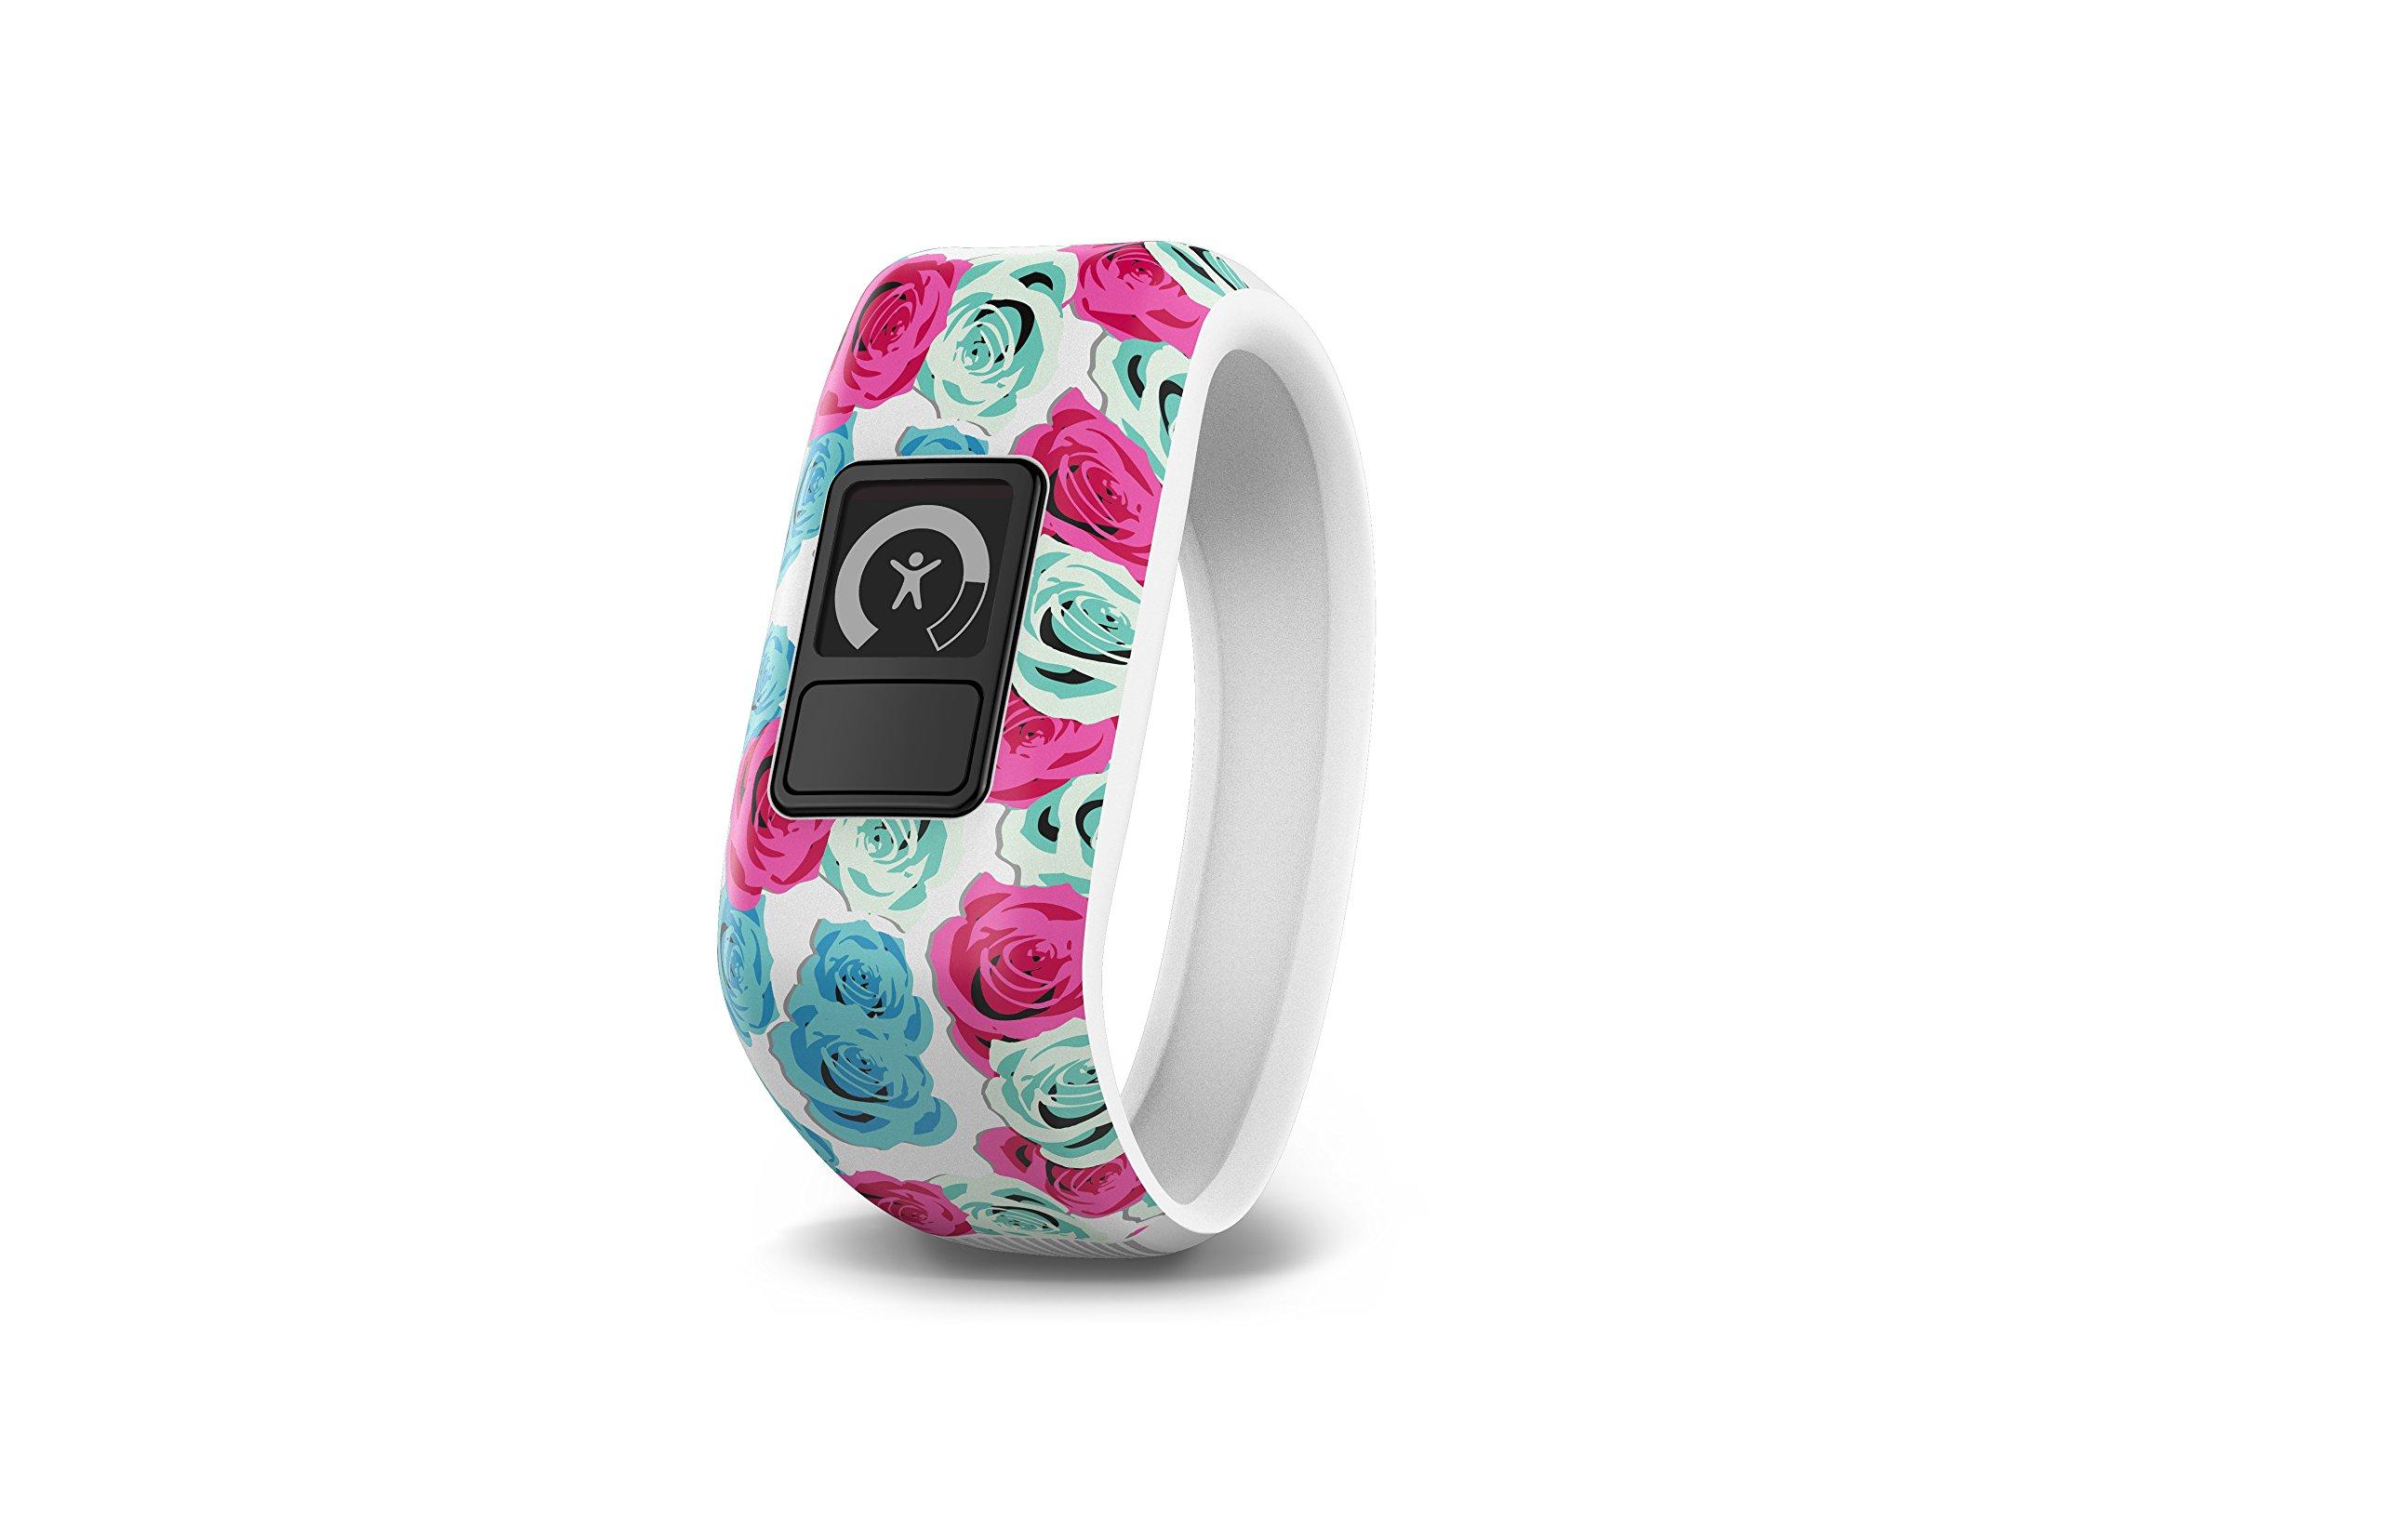 Garmin vívofit jr, Kids Fitness/Activity Tracker, 1year Battery Life, Real Flower